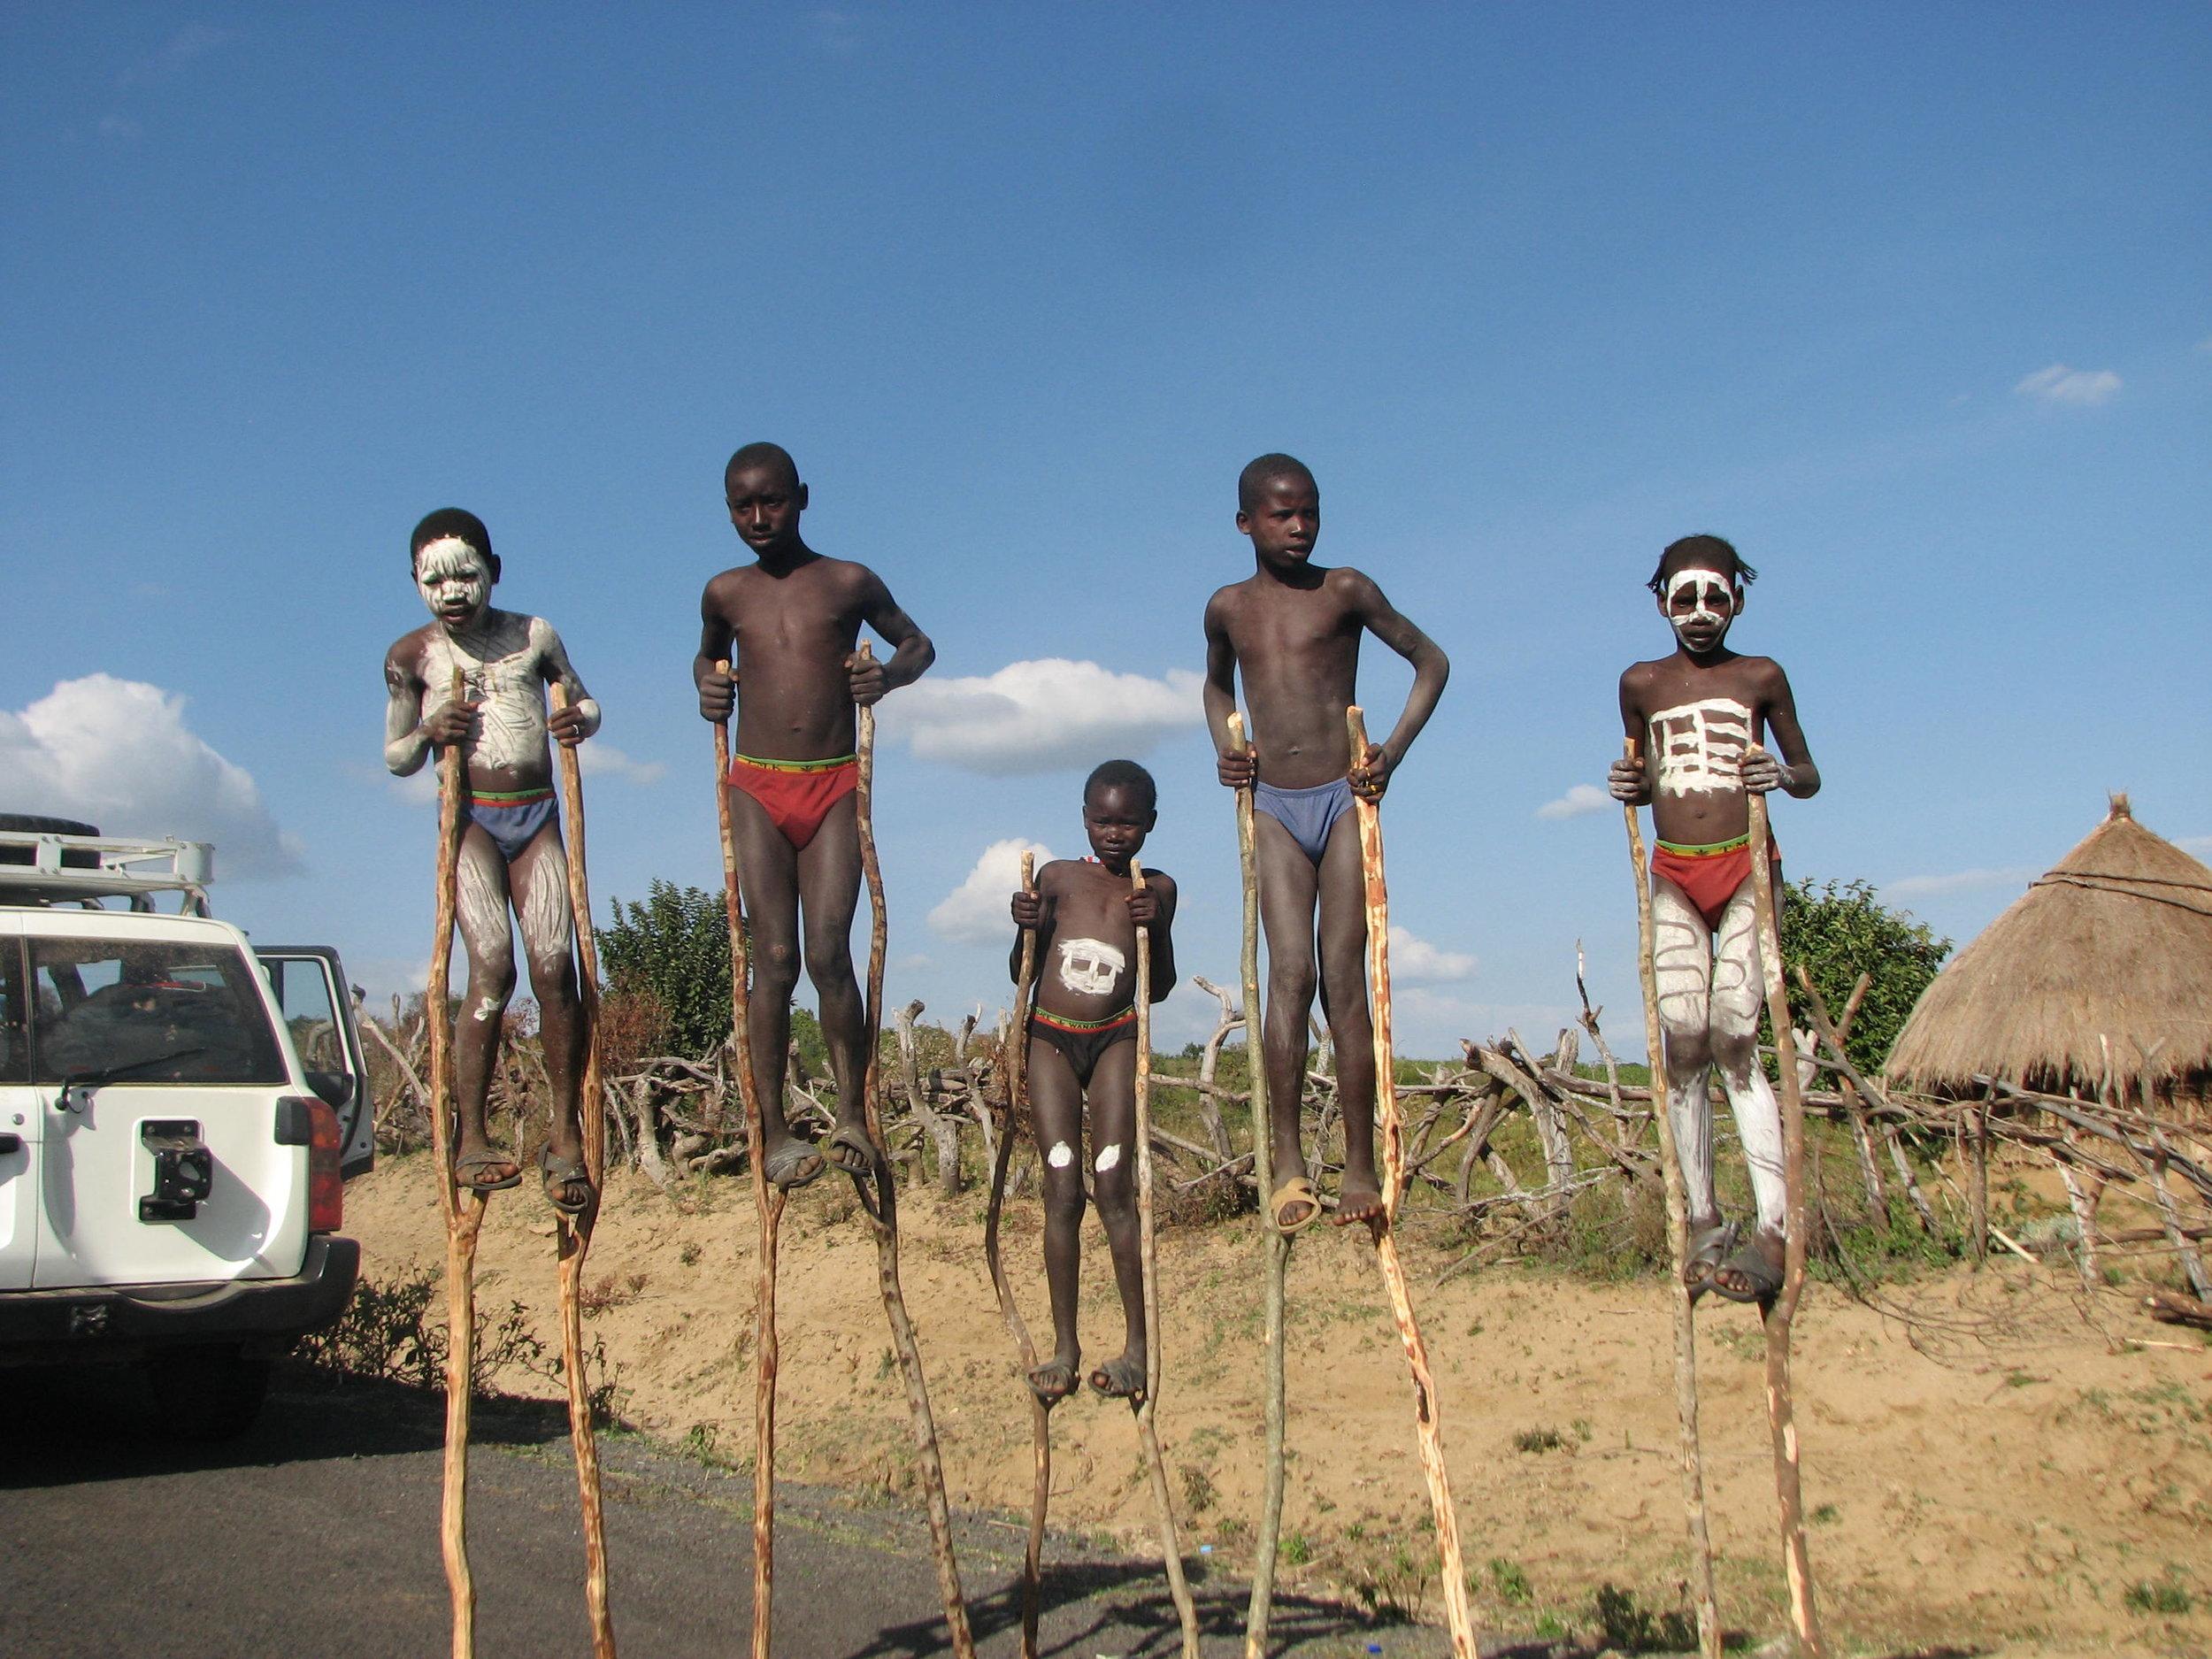 etiopia-valle-dell-omo-ragazzi-trampoli.jpg